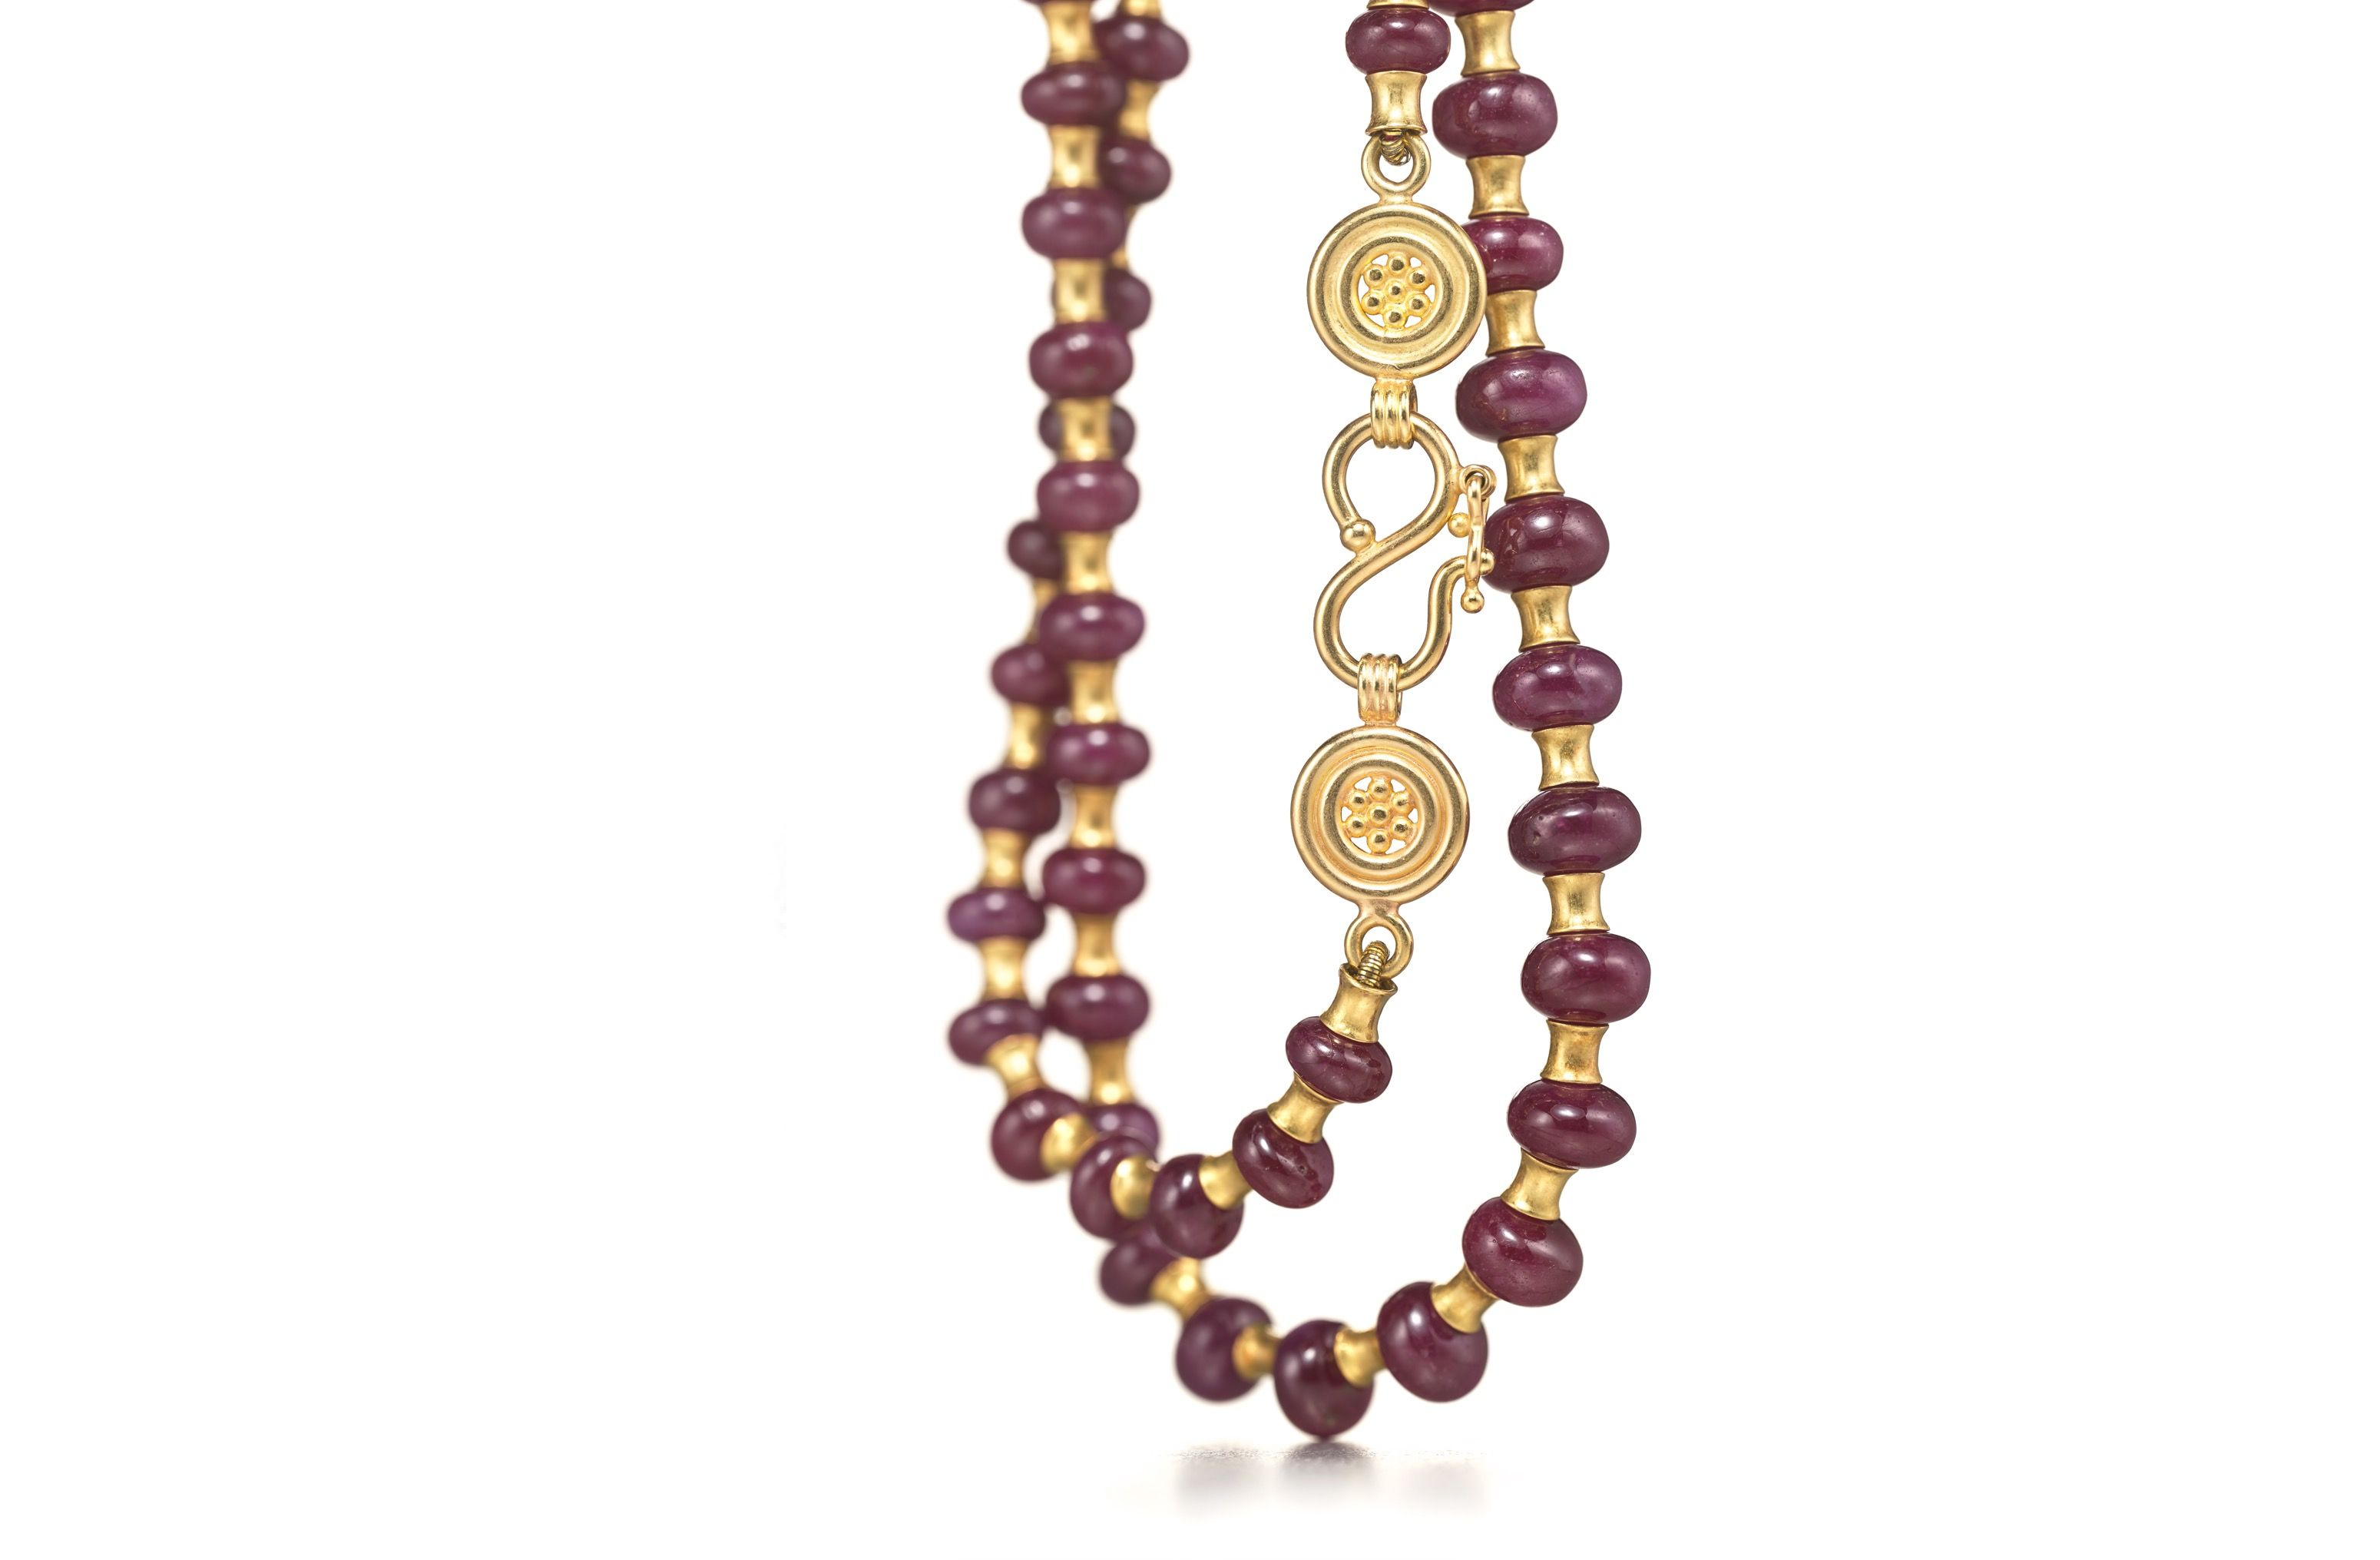 JewelryWhite_28.jpg